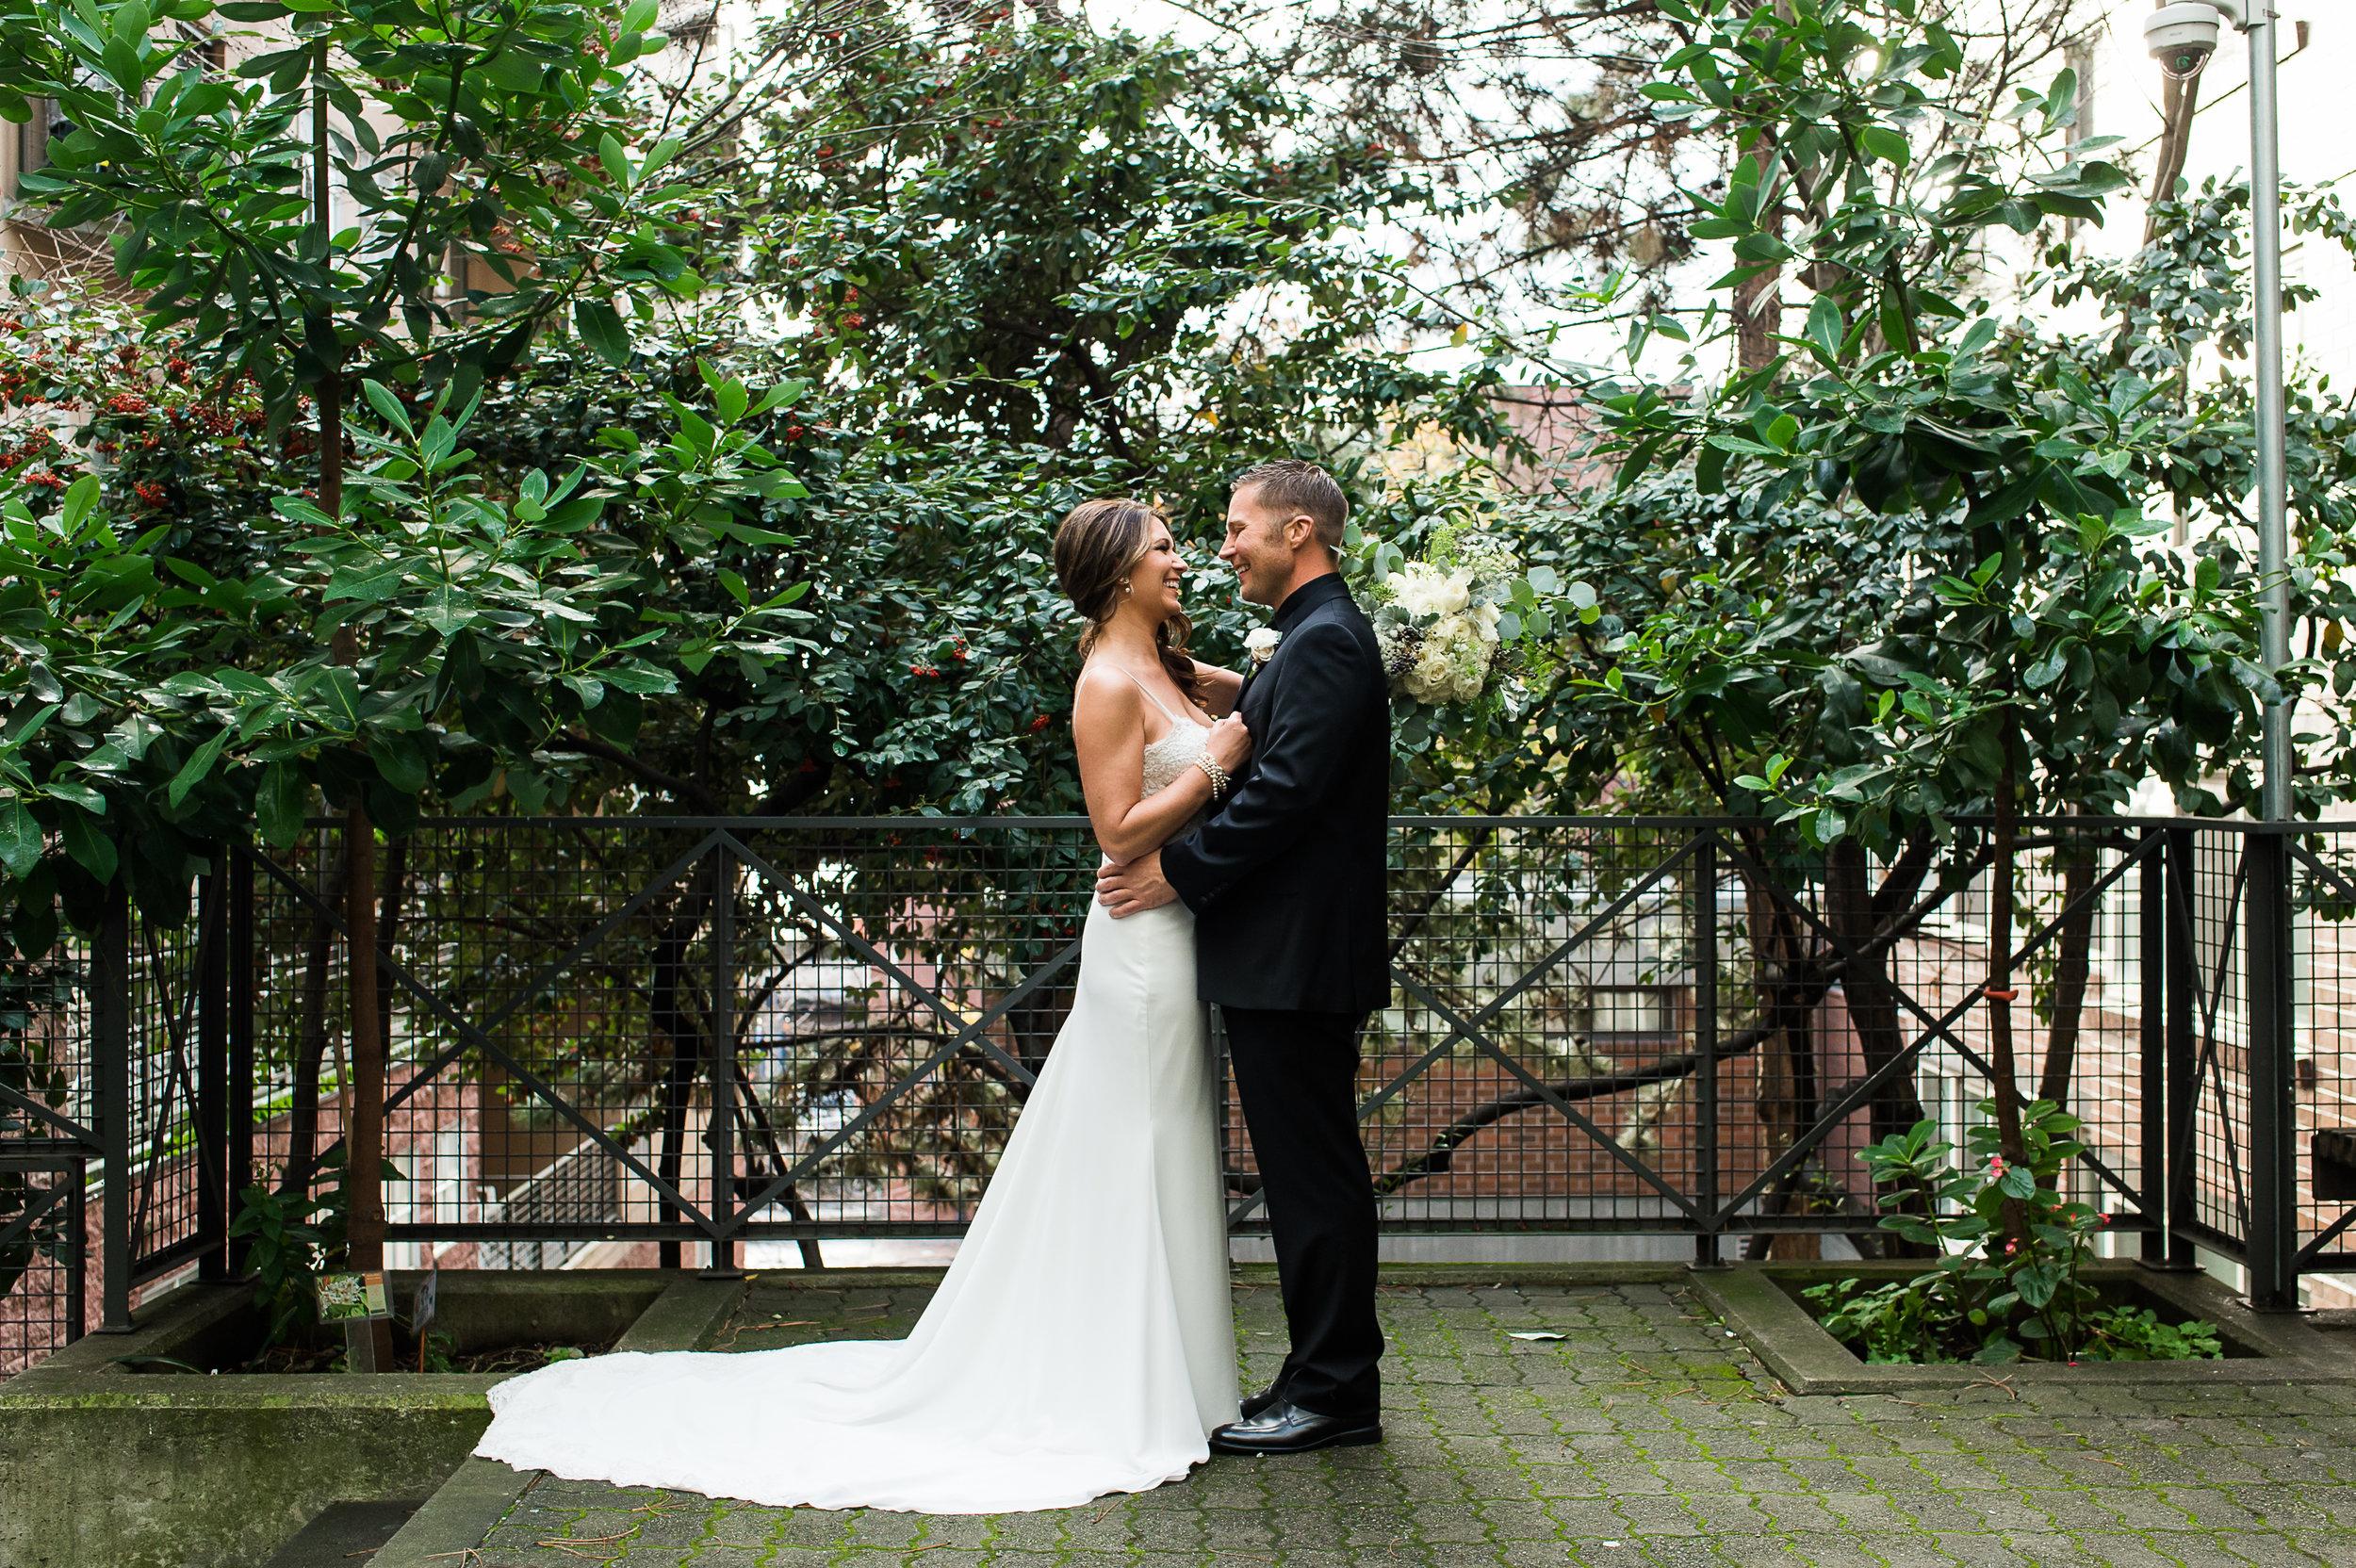 JJ-wedding-Van-Wyhe-Photography-182.jpg